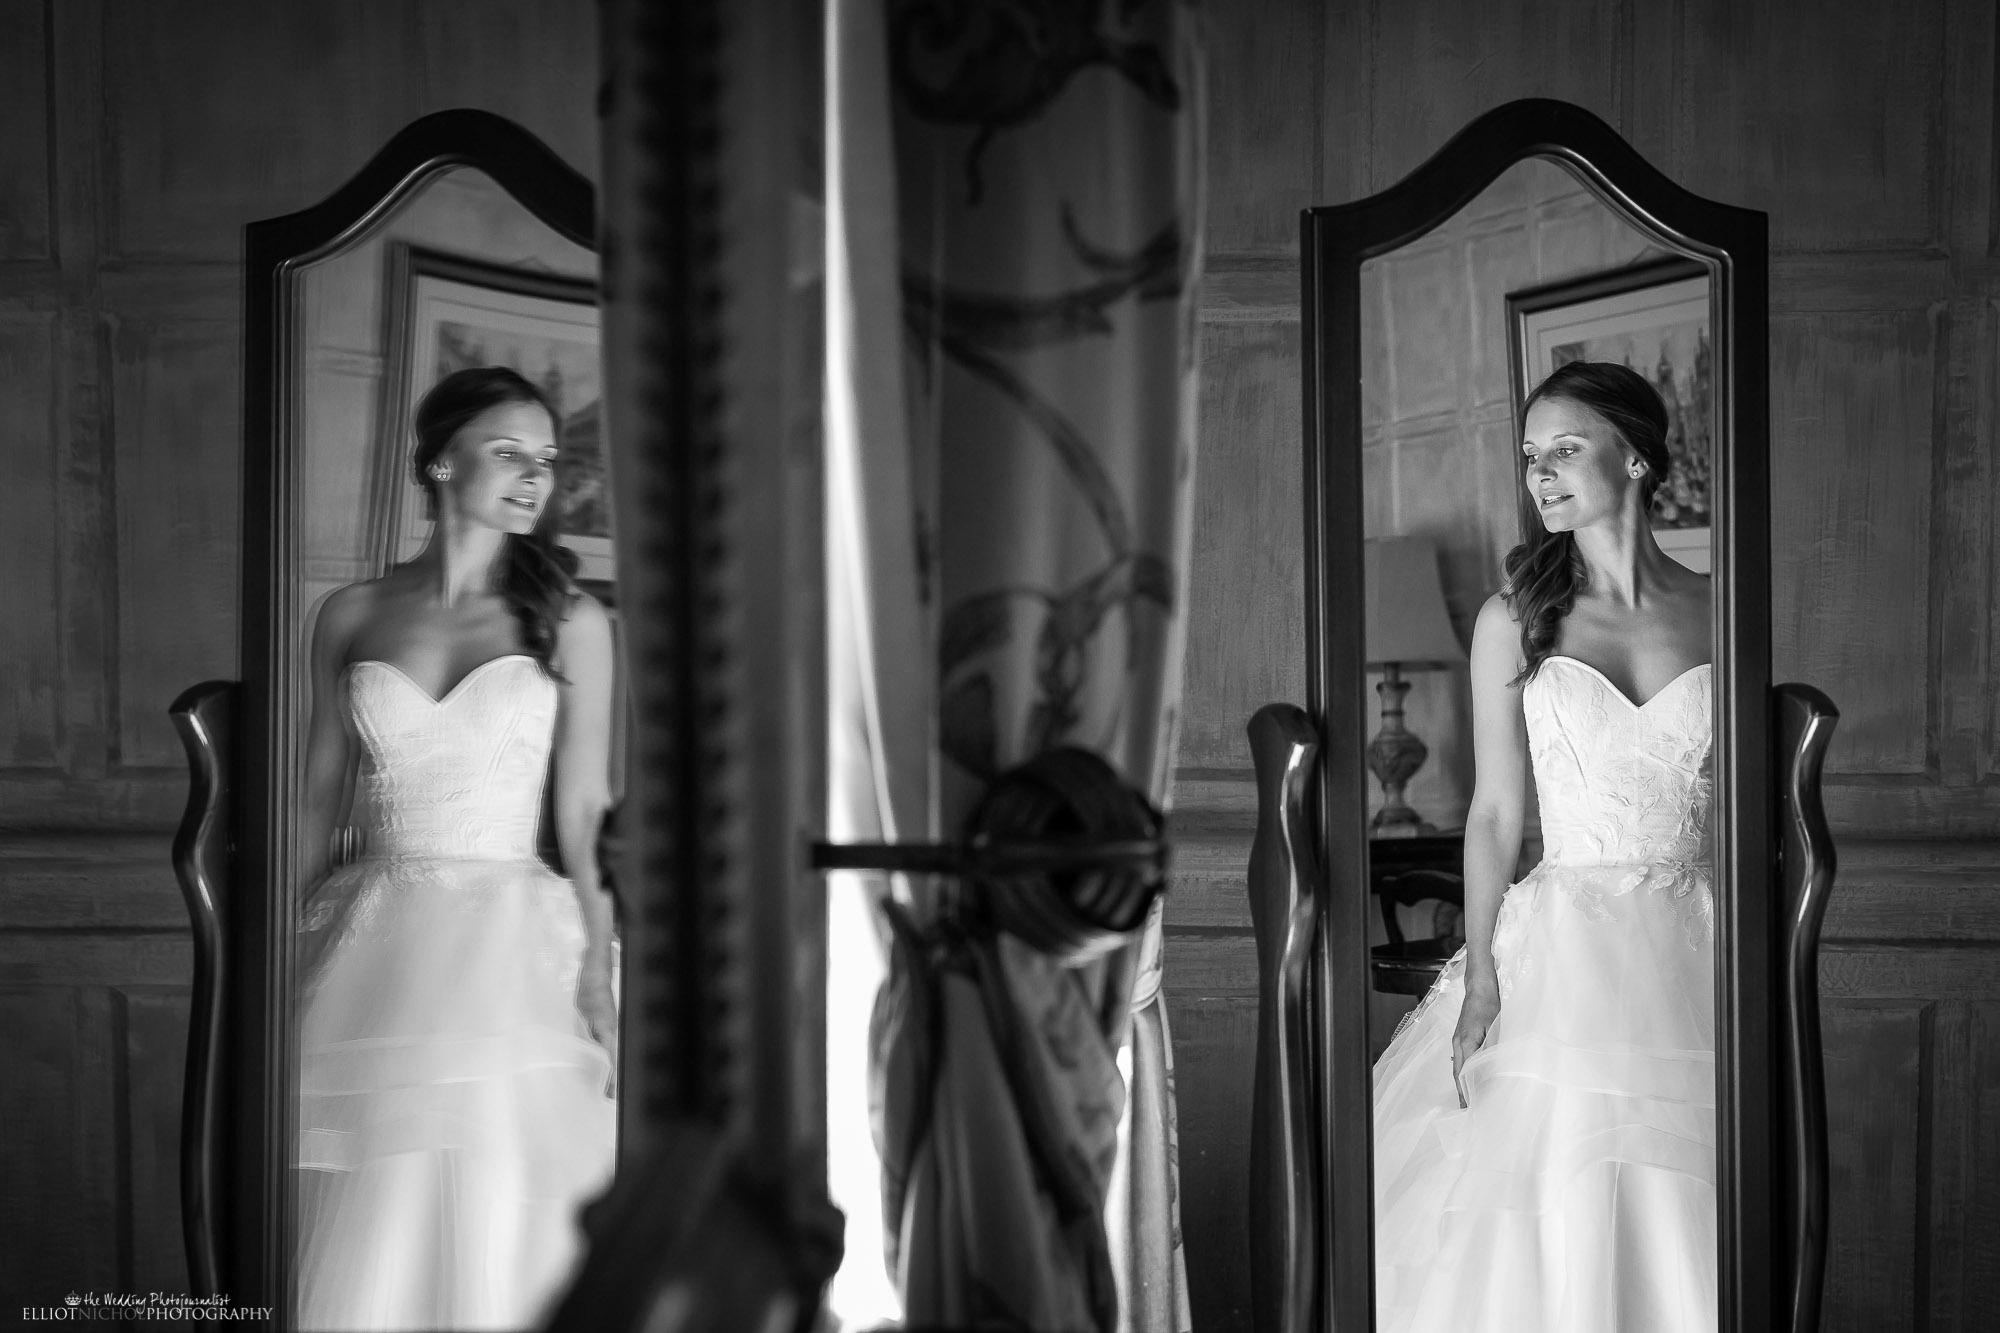 bride-wedding-day-photography-mirror-reflection-Northeast